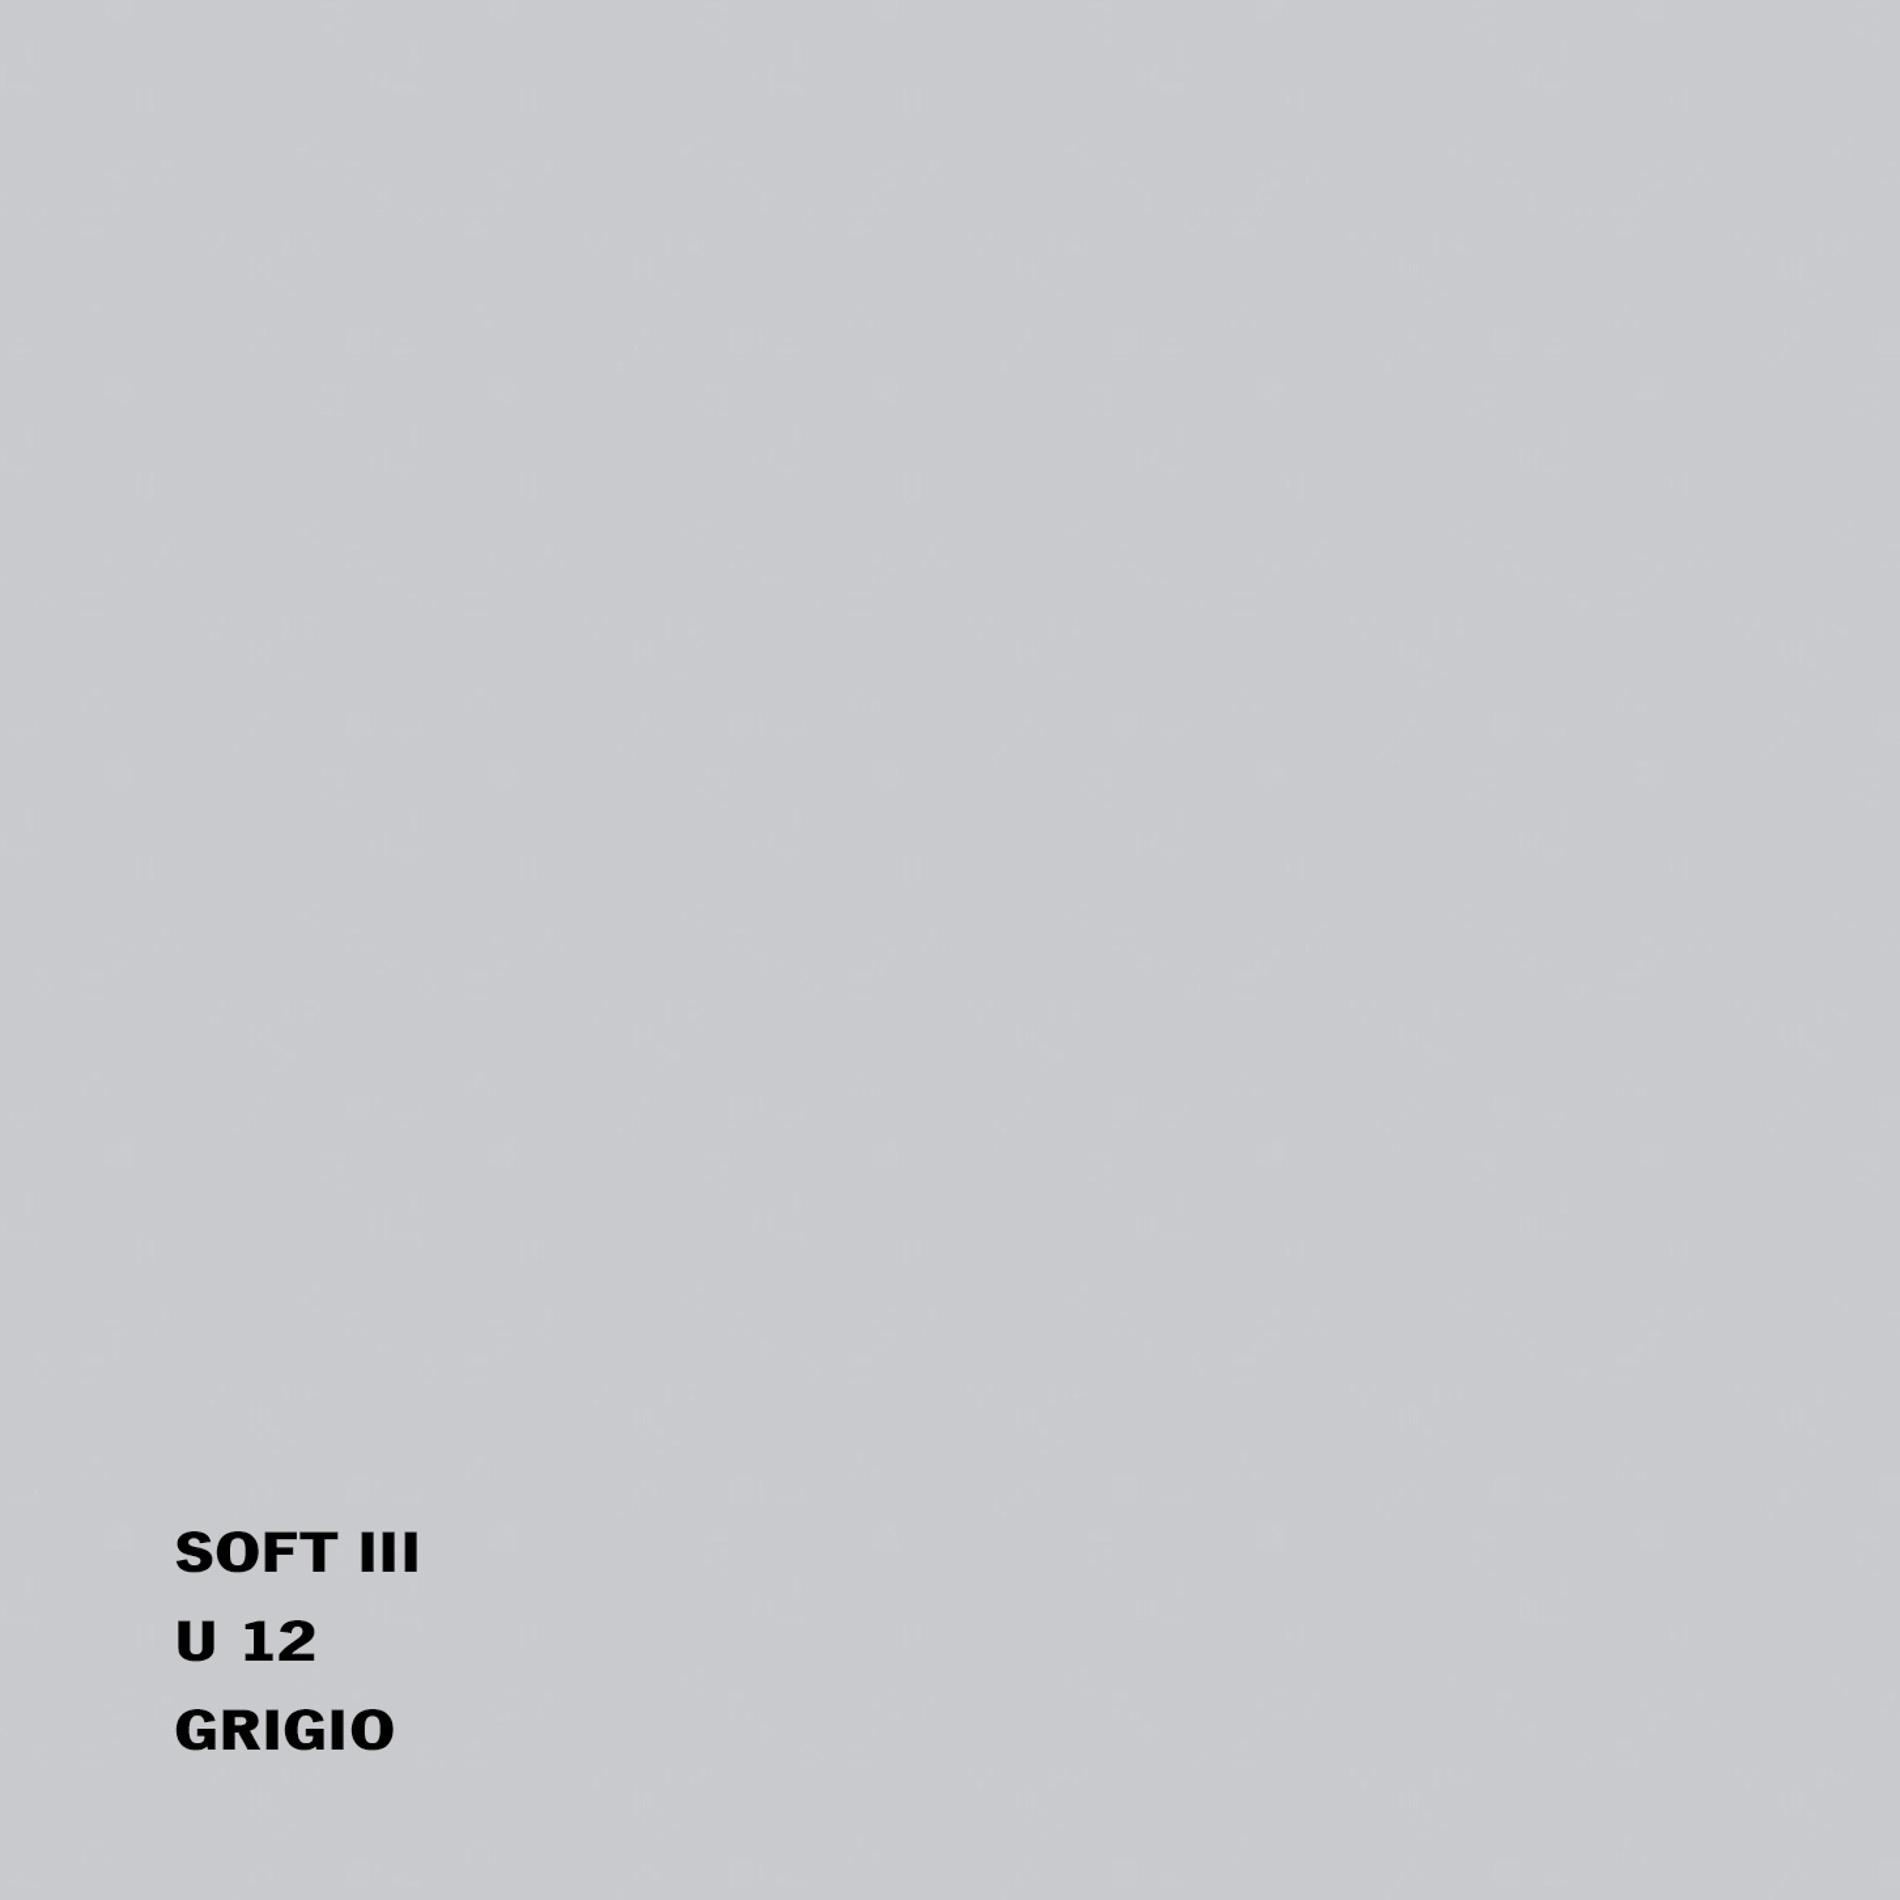 U12_GRIGIO_SOFT III